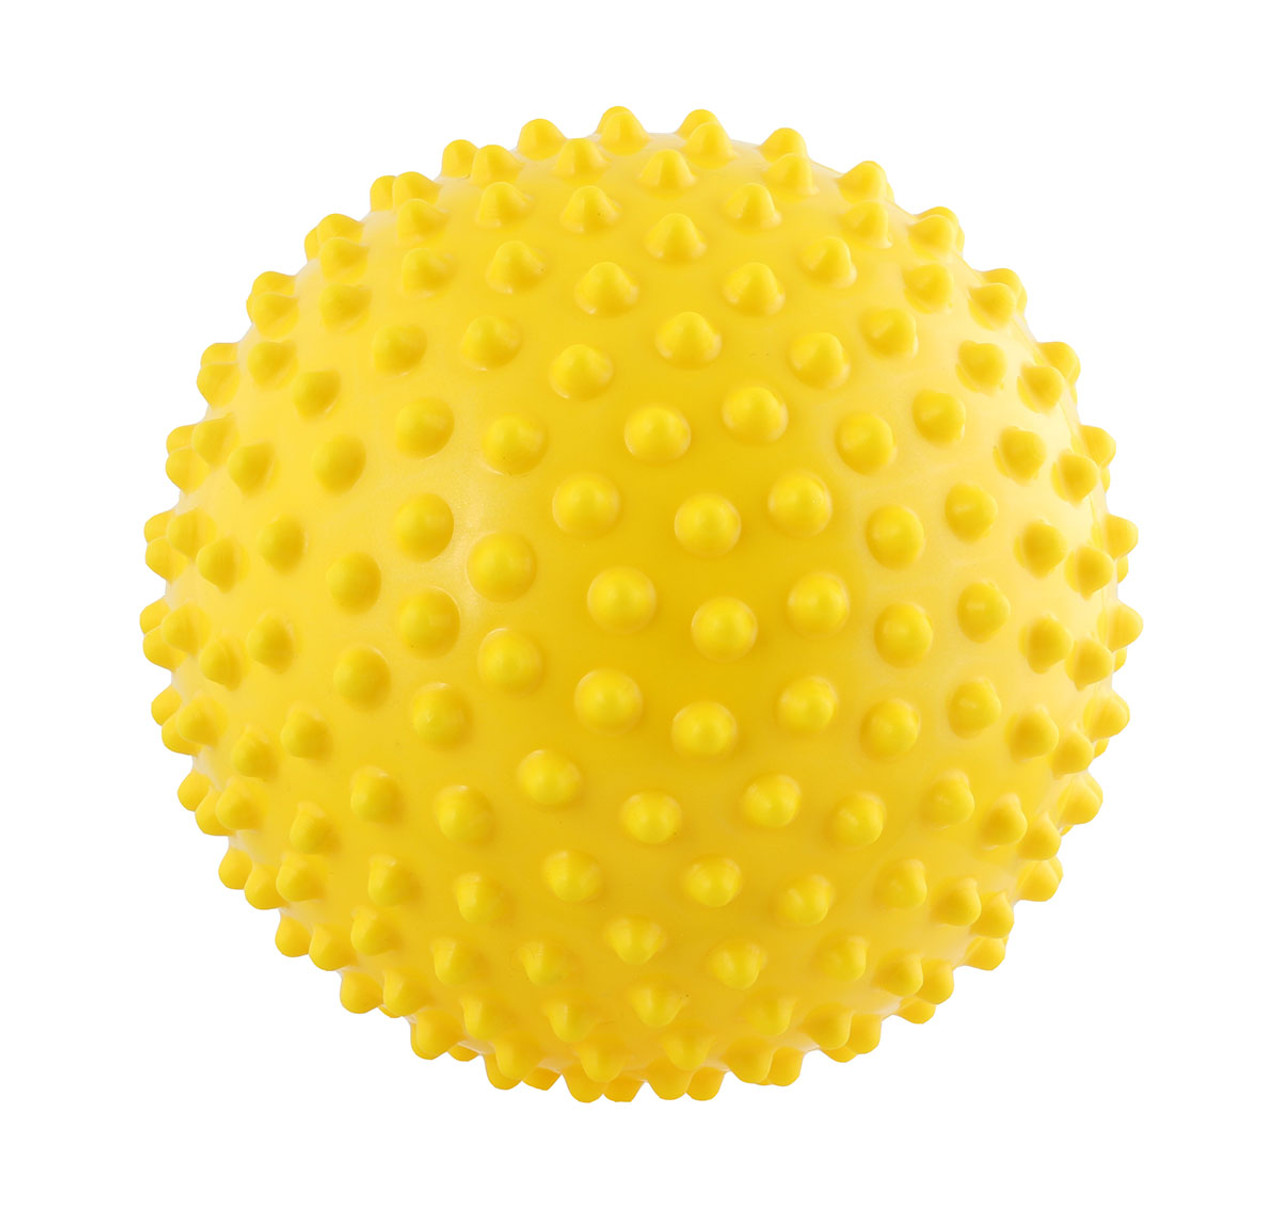 Massage ball, 15 cm (6.0 inches), yellow,  1 dozen